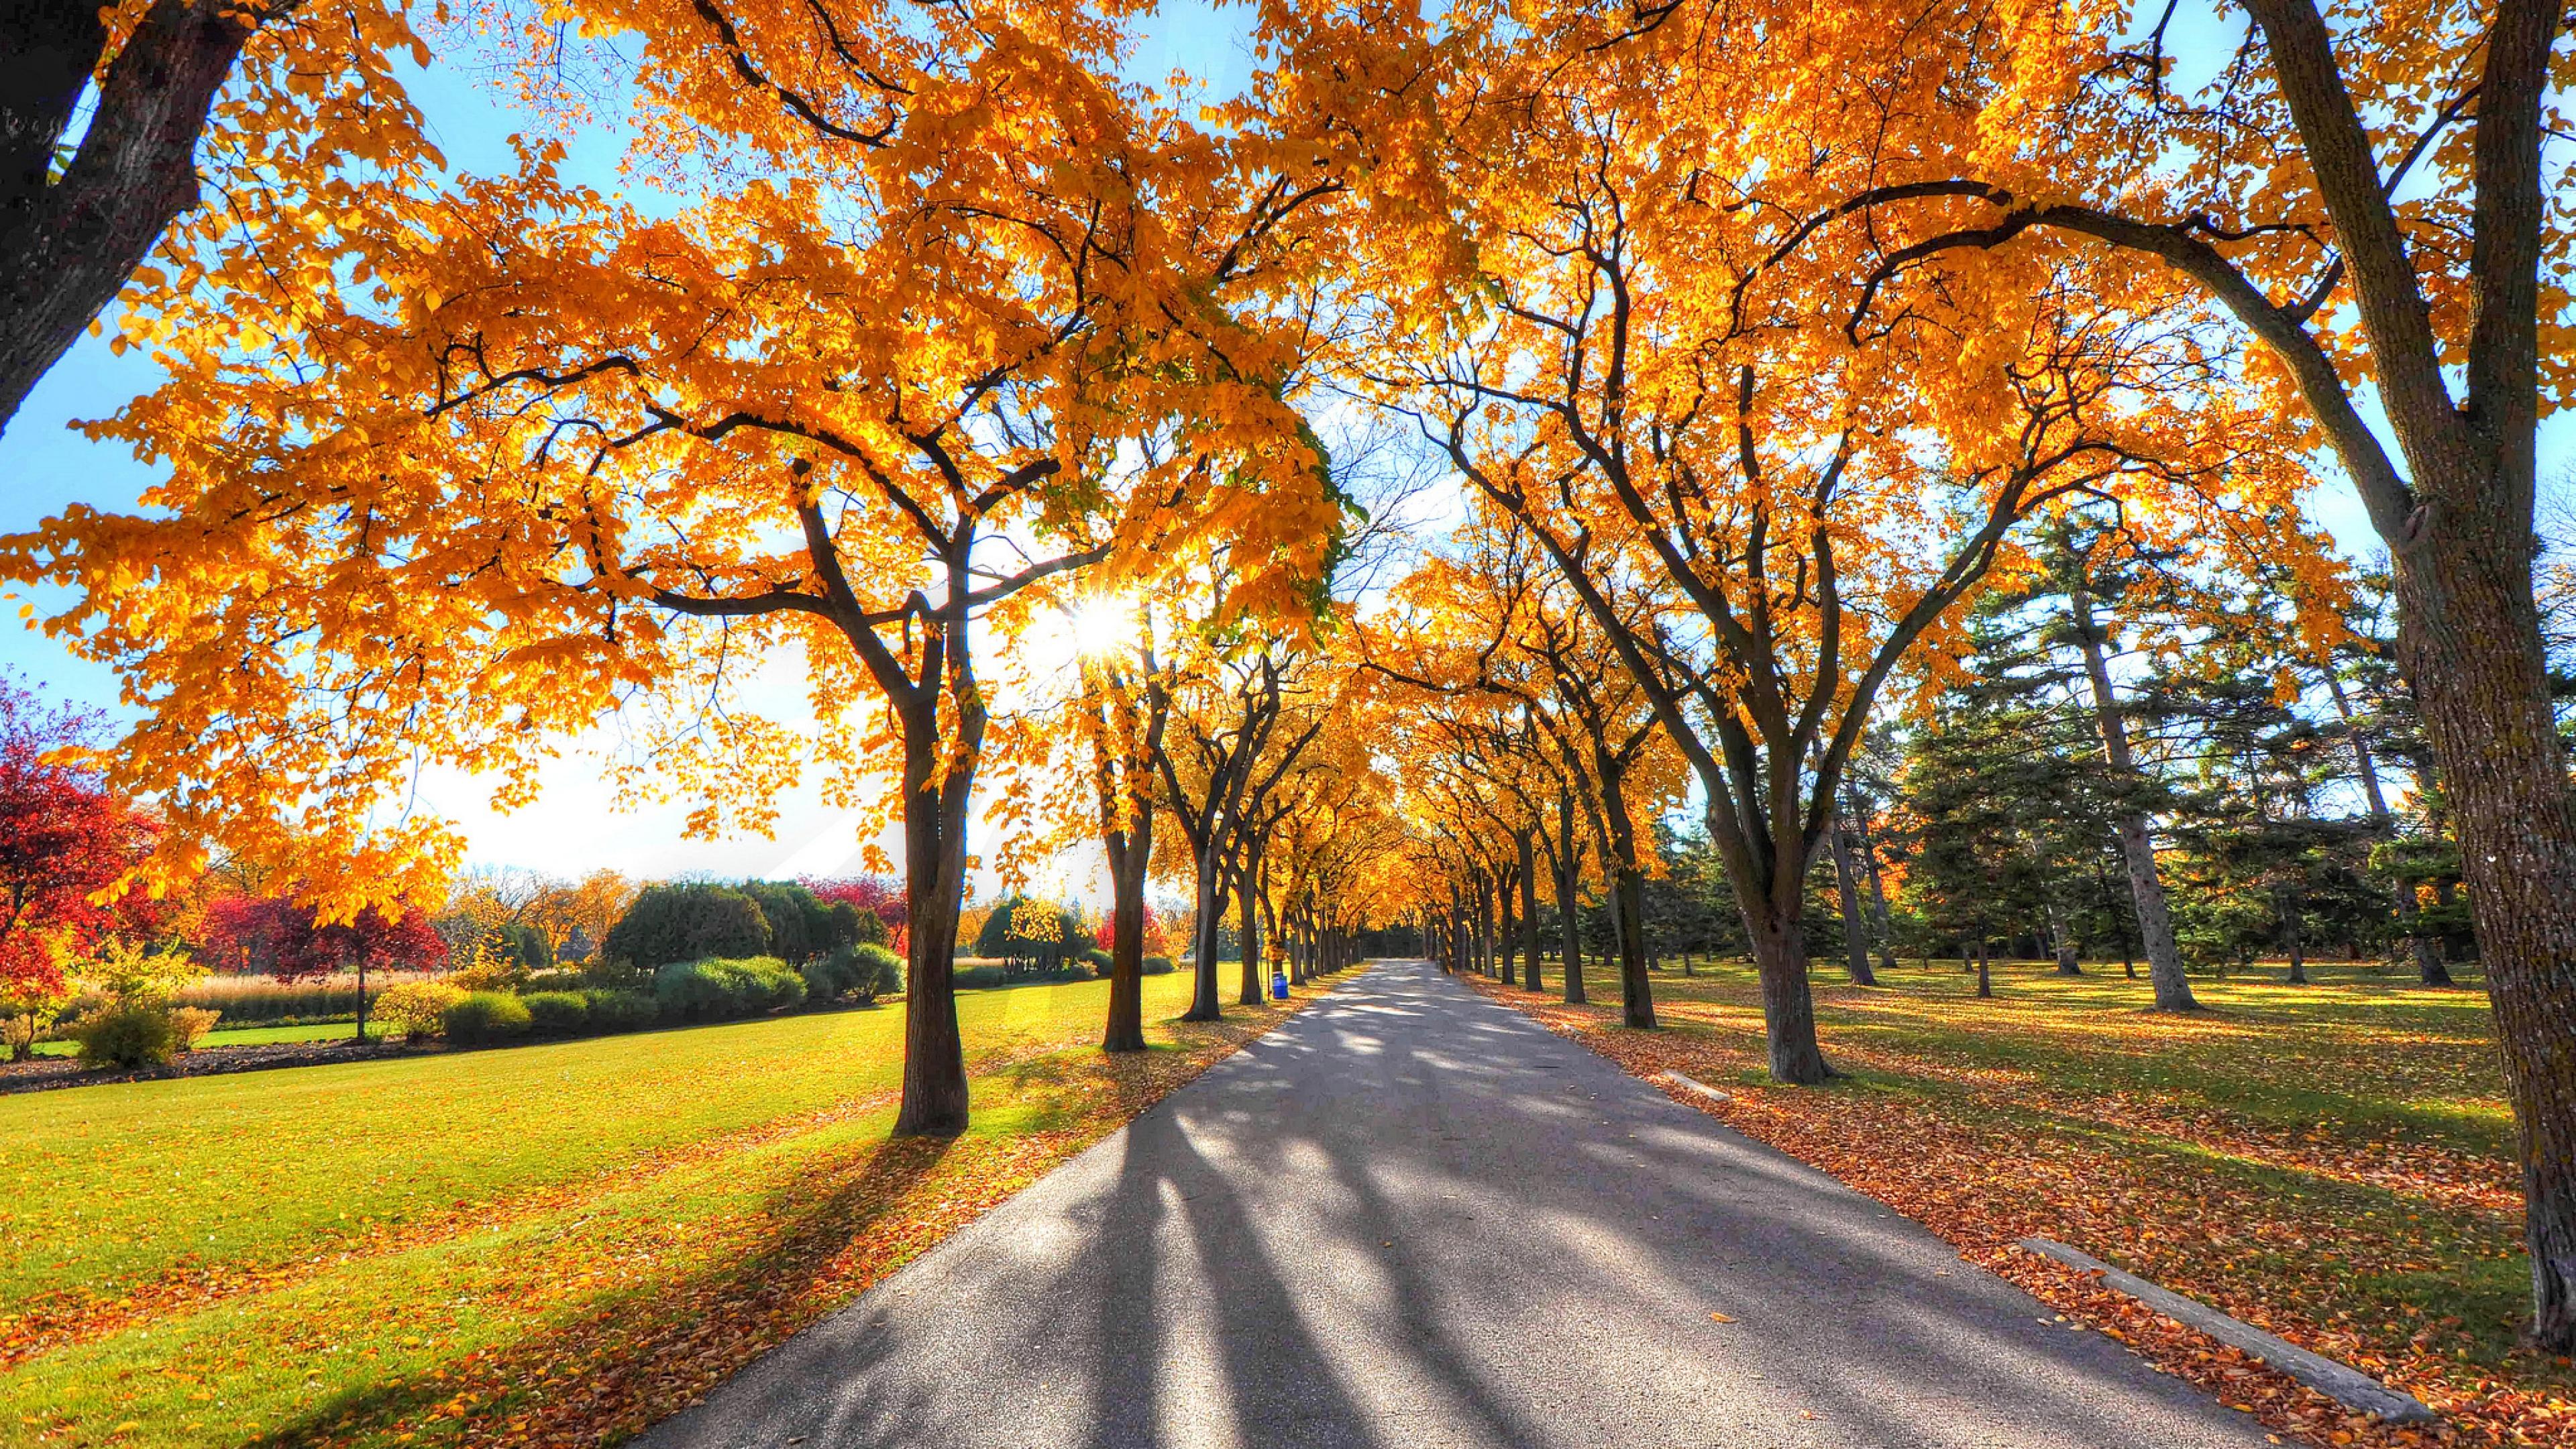 autumn alley park 1535923918 - Autumn Alley Park - trees wallpapers, park wallpapers, nature wallpapers, autumn wallpapers